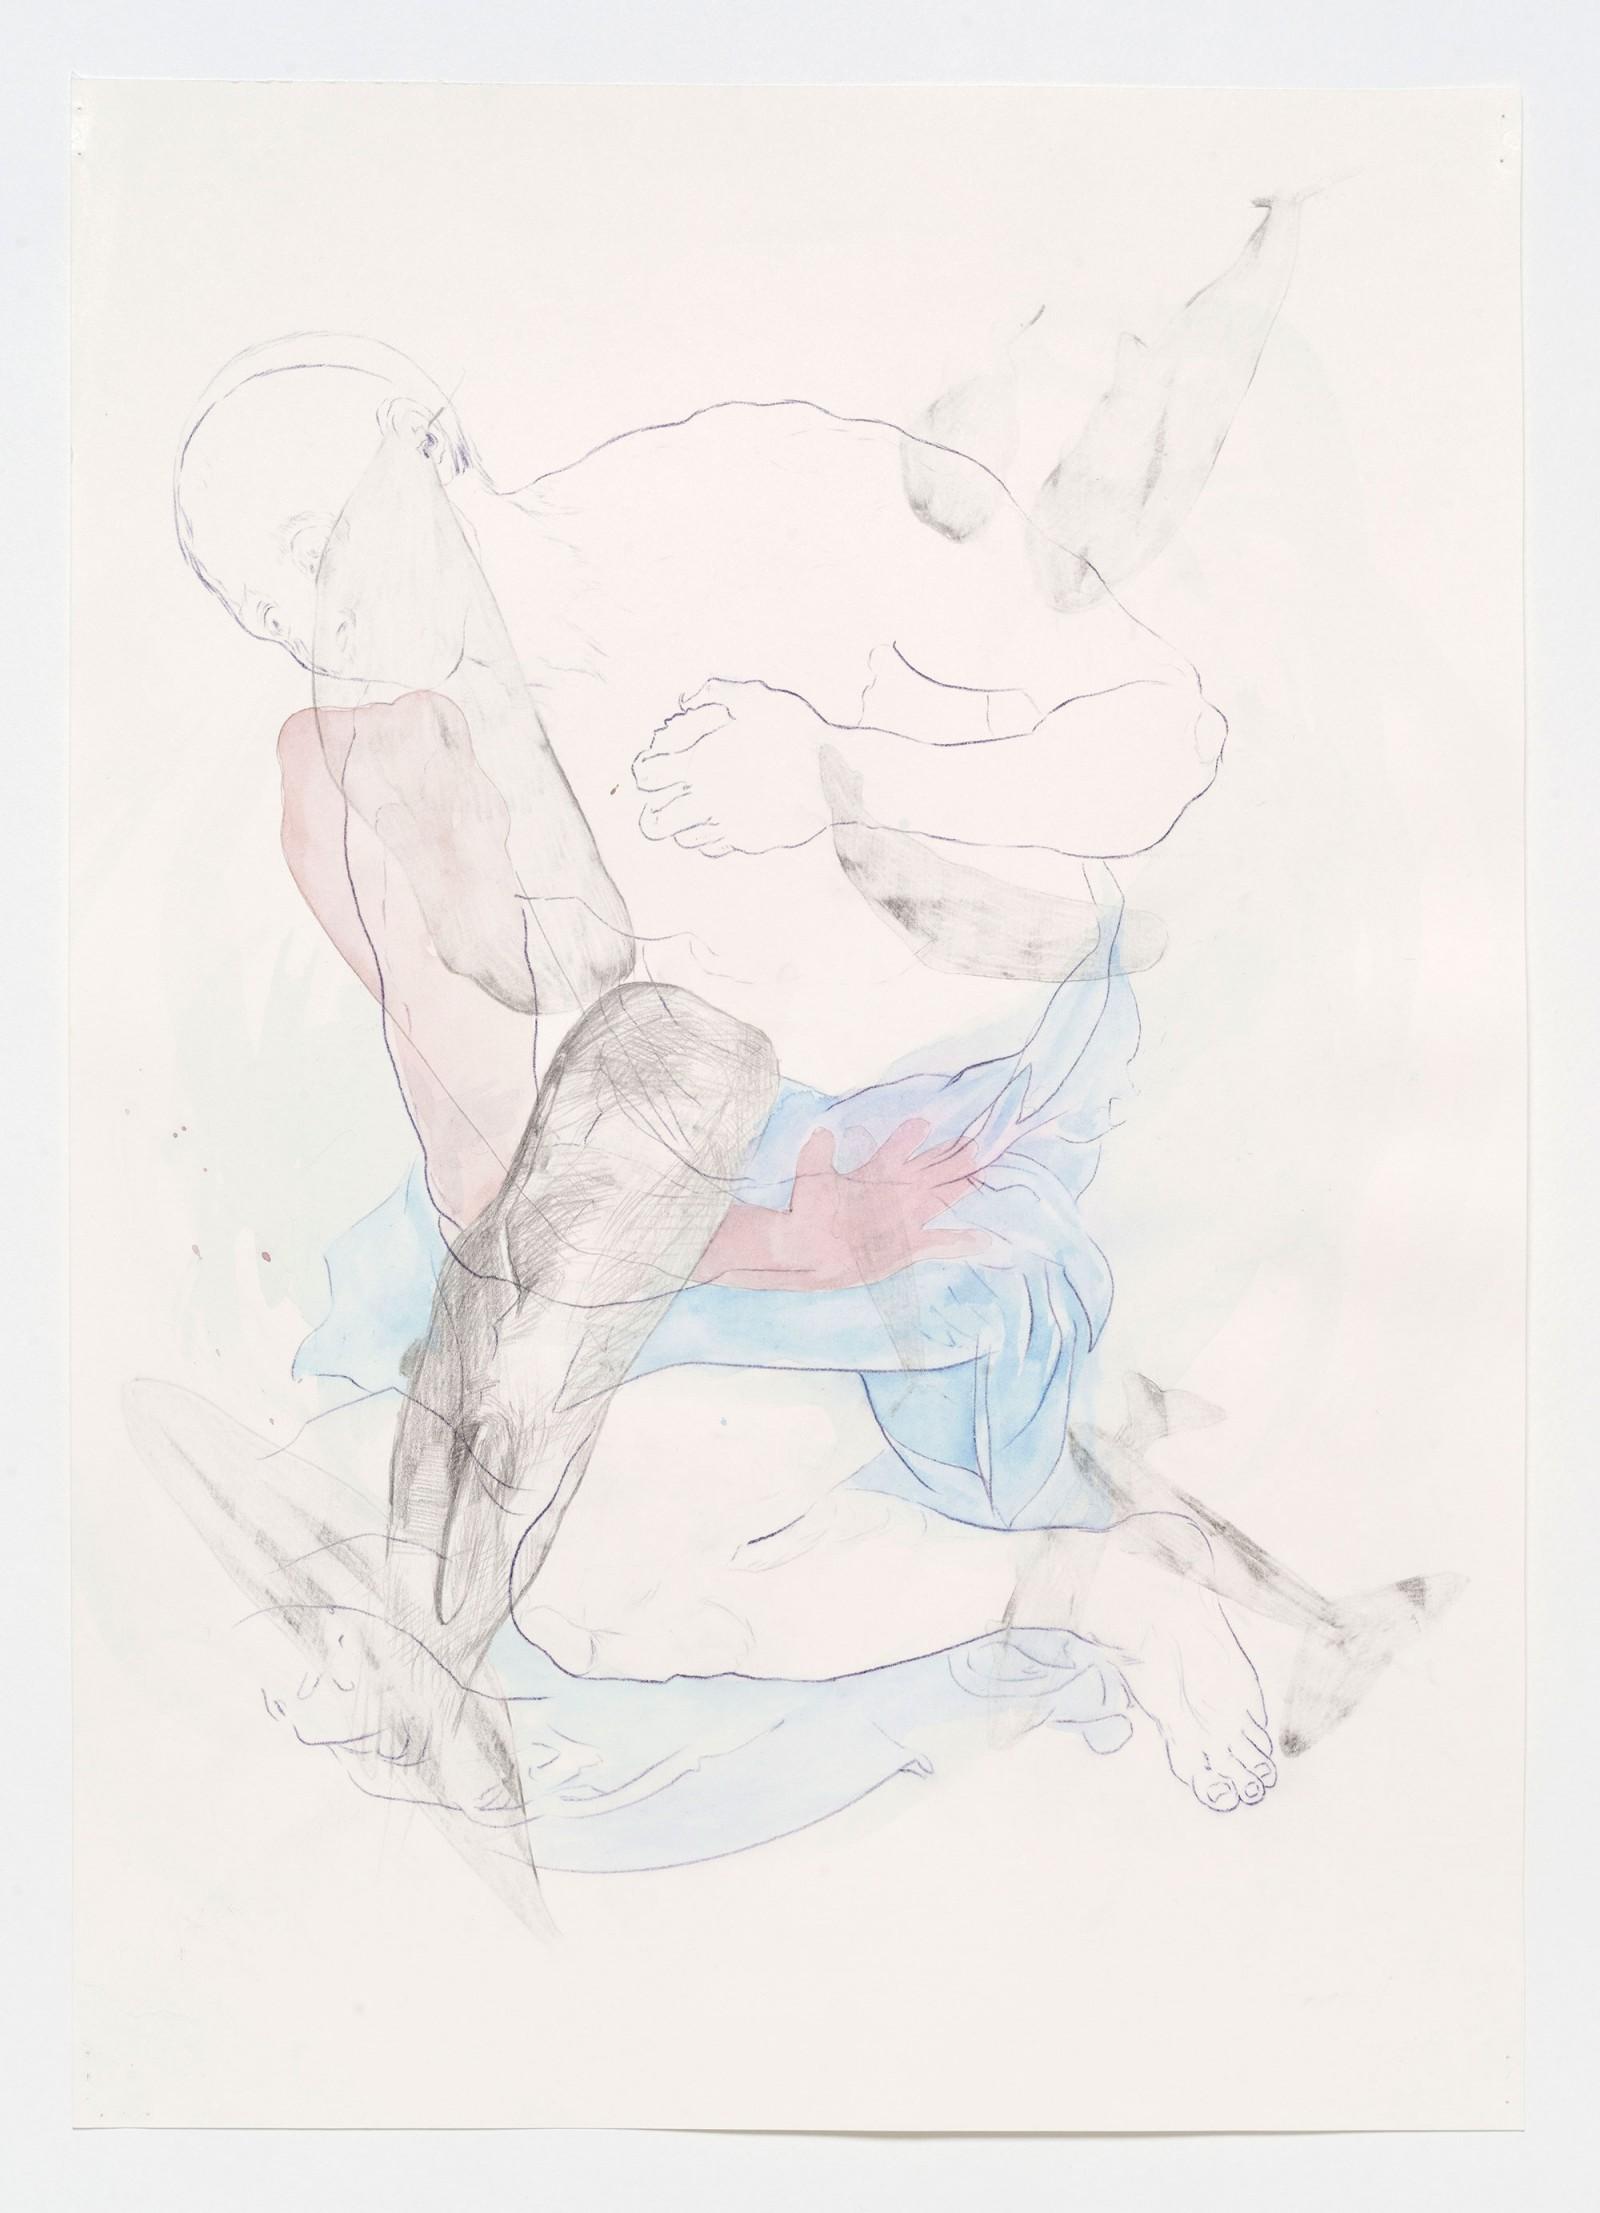 Kim Nekarda: untitled, 2019, carbon, pencil & watercolour on paper, 48 x 34 cm